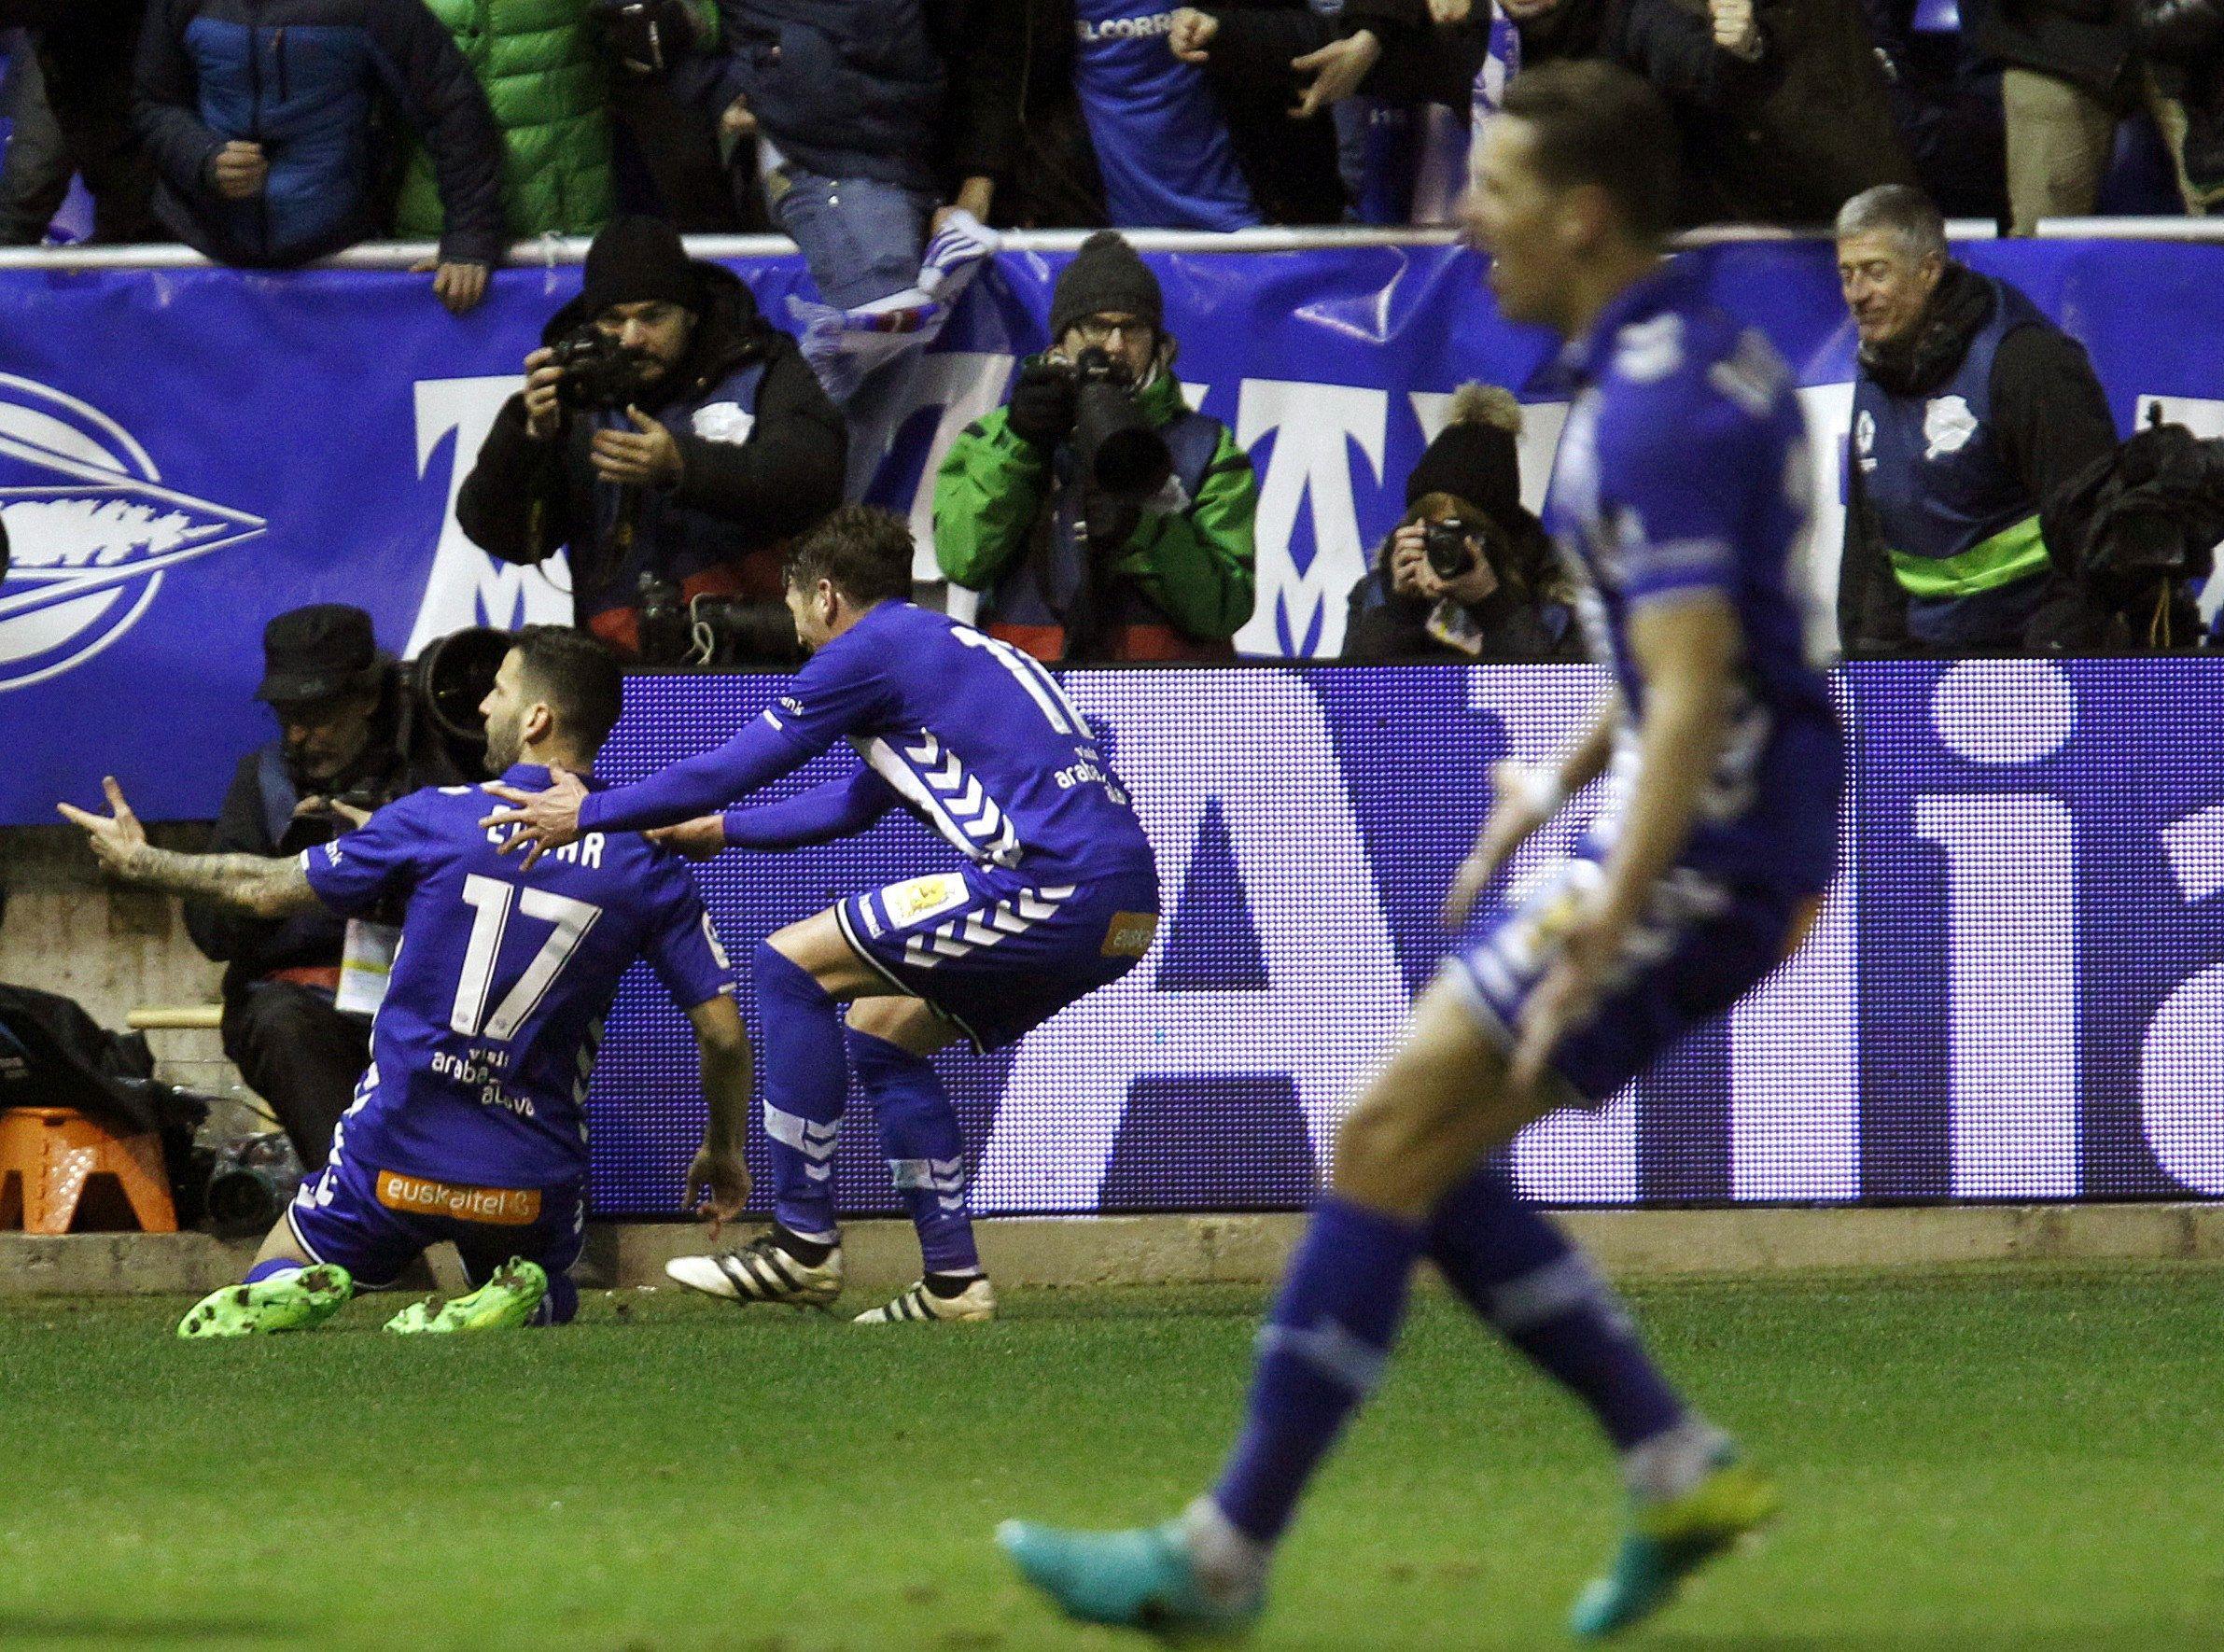 Copa del Rey: el Alavés de Pellegrino eliminó al Celta de Berizzo